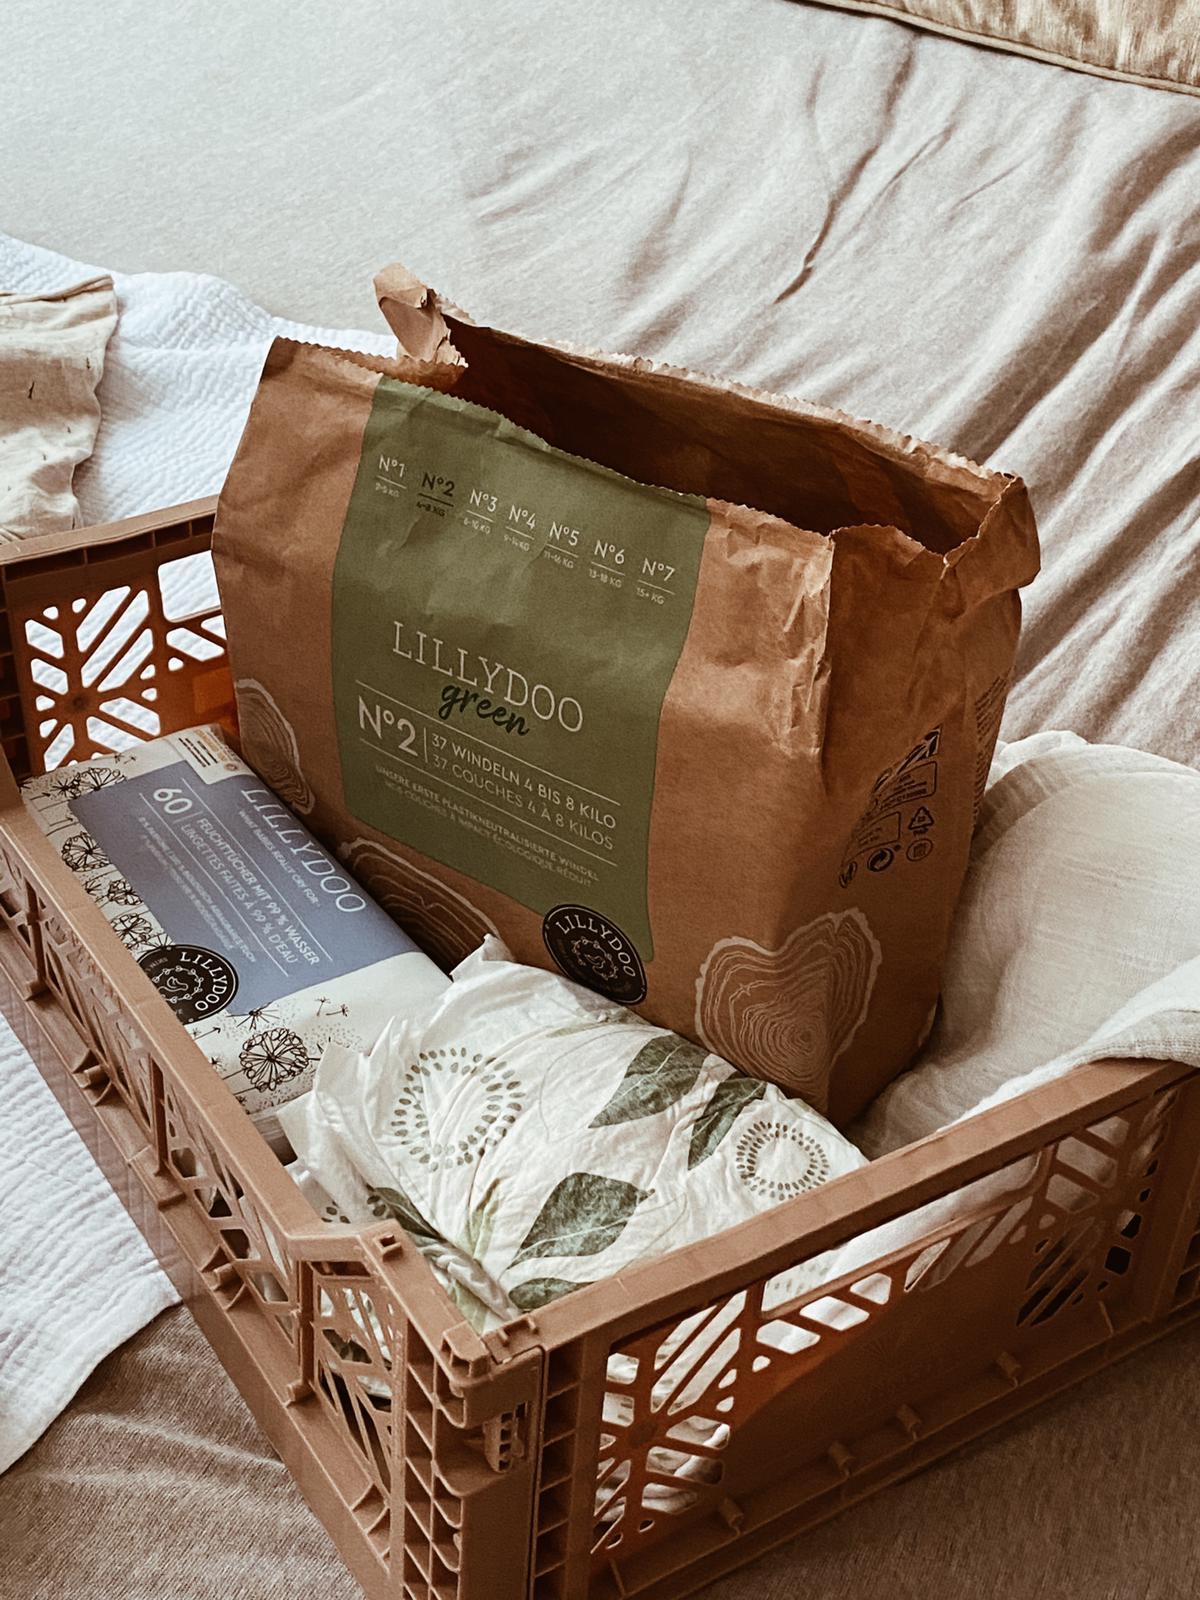 Lillydoo green caja pañales ecológicos mammaproof